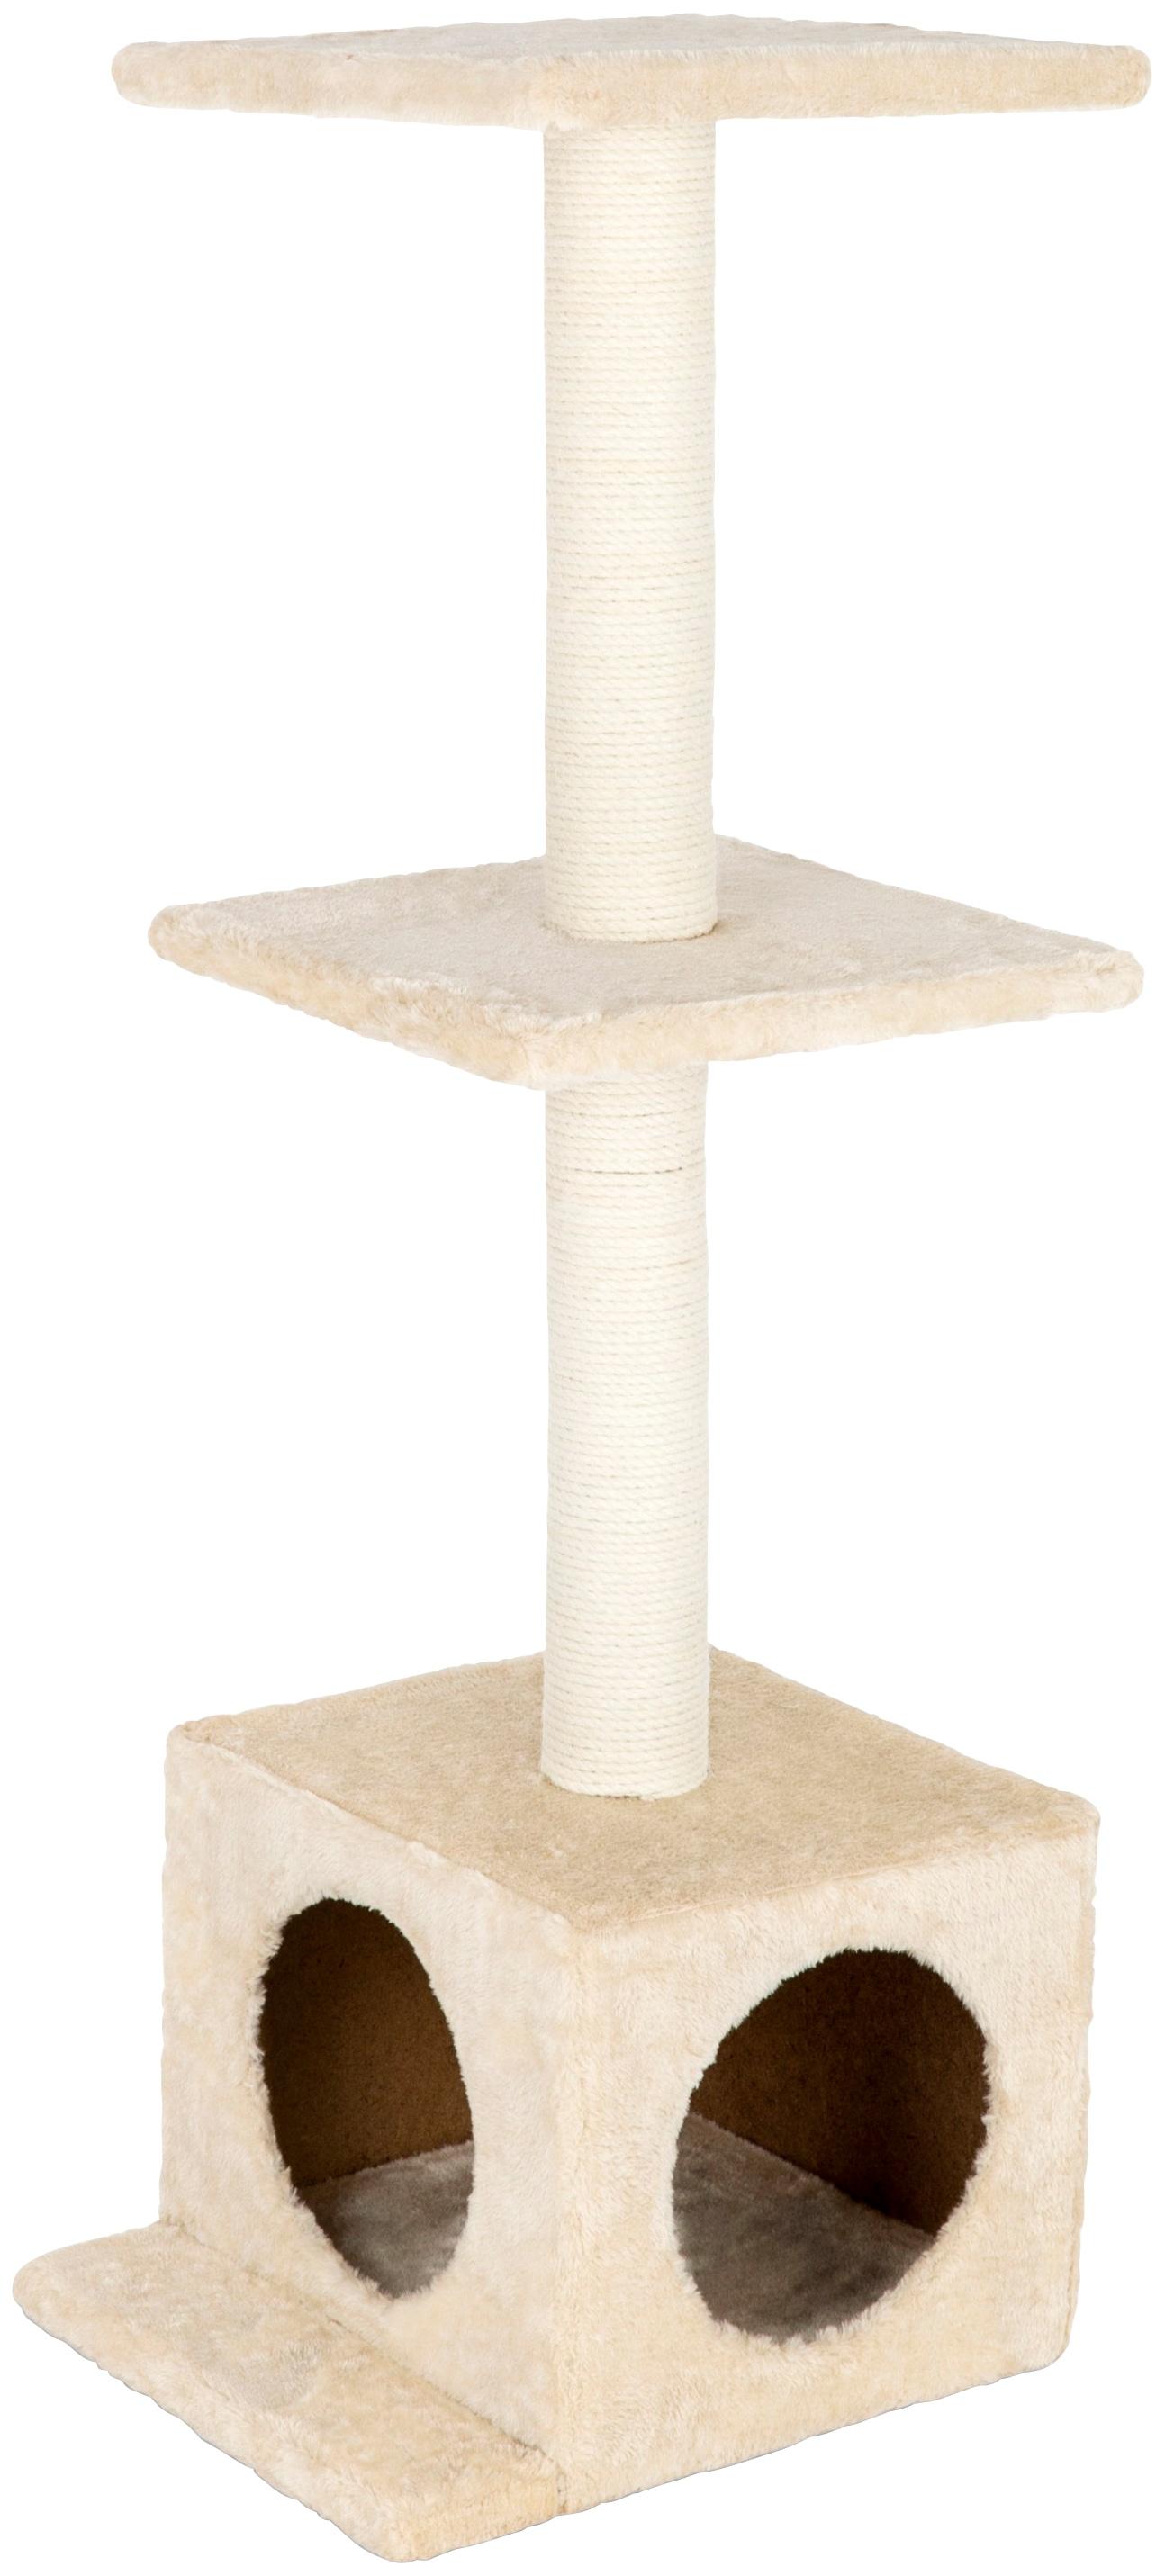 petolina kratzbaum delia bxtxh 36x30x97 cm auf. Black Bedroom Furniture Sets. Home Design Ideas